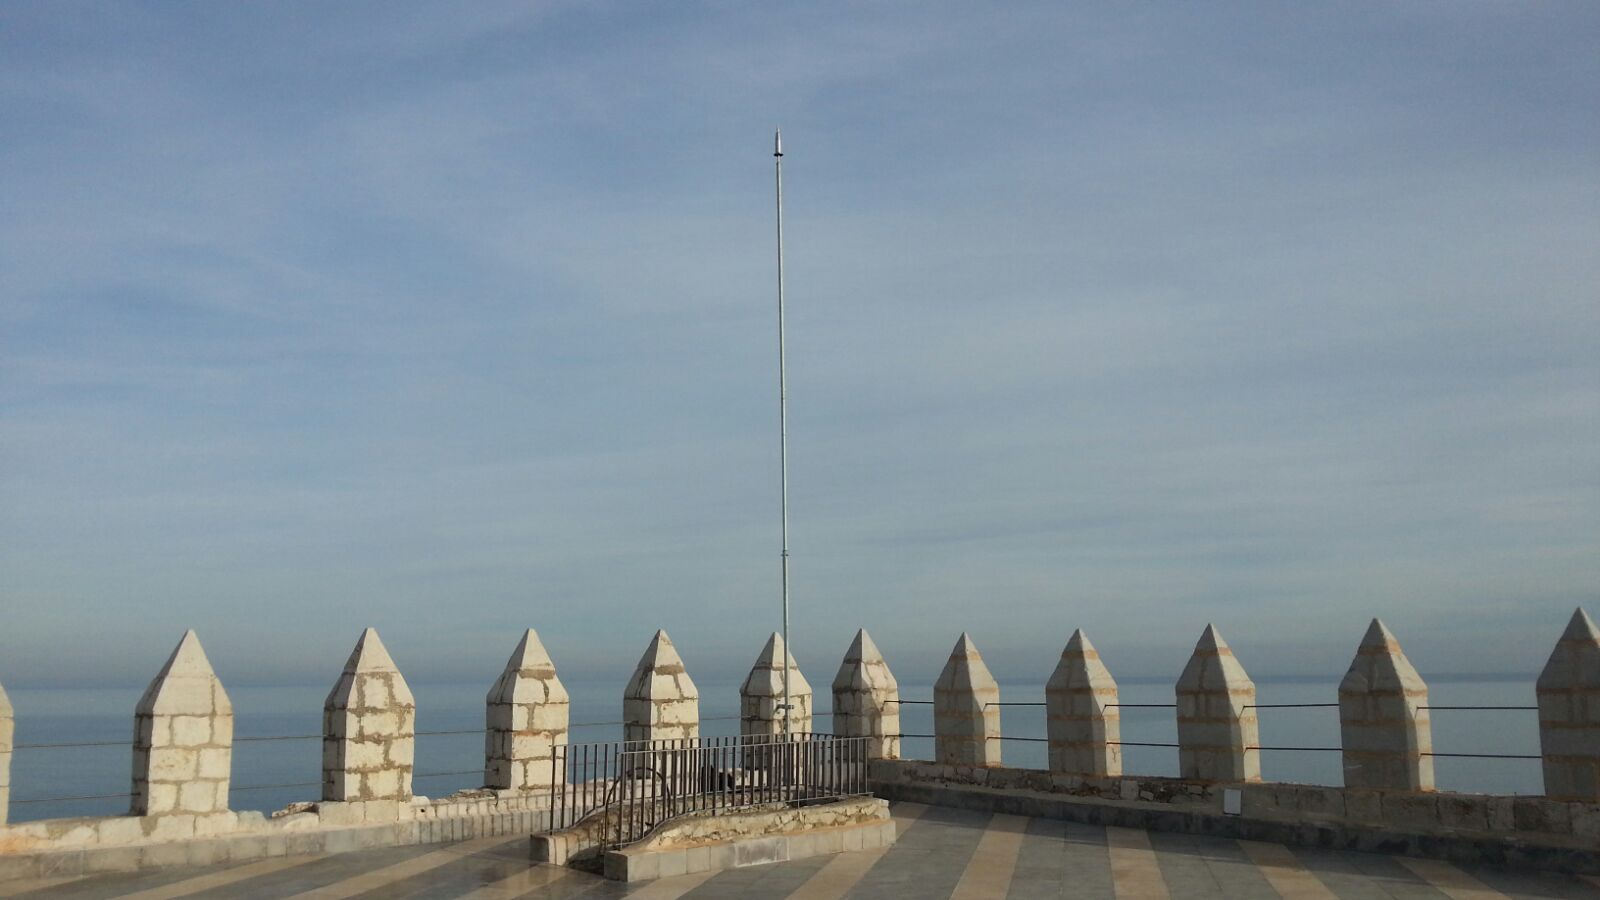 Aplicaciones Tecnológicas, S.A. protects Peñíscola Castle against lightning strikes